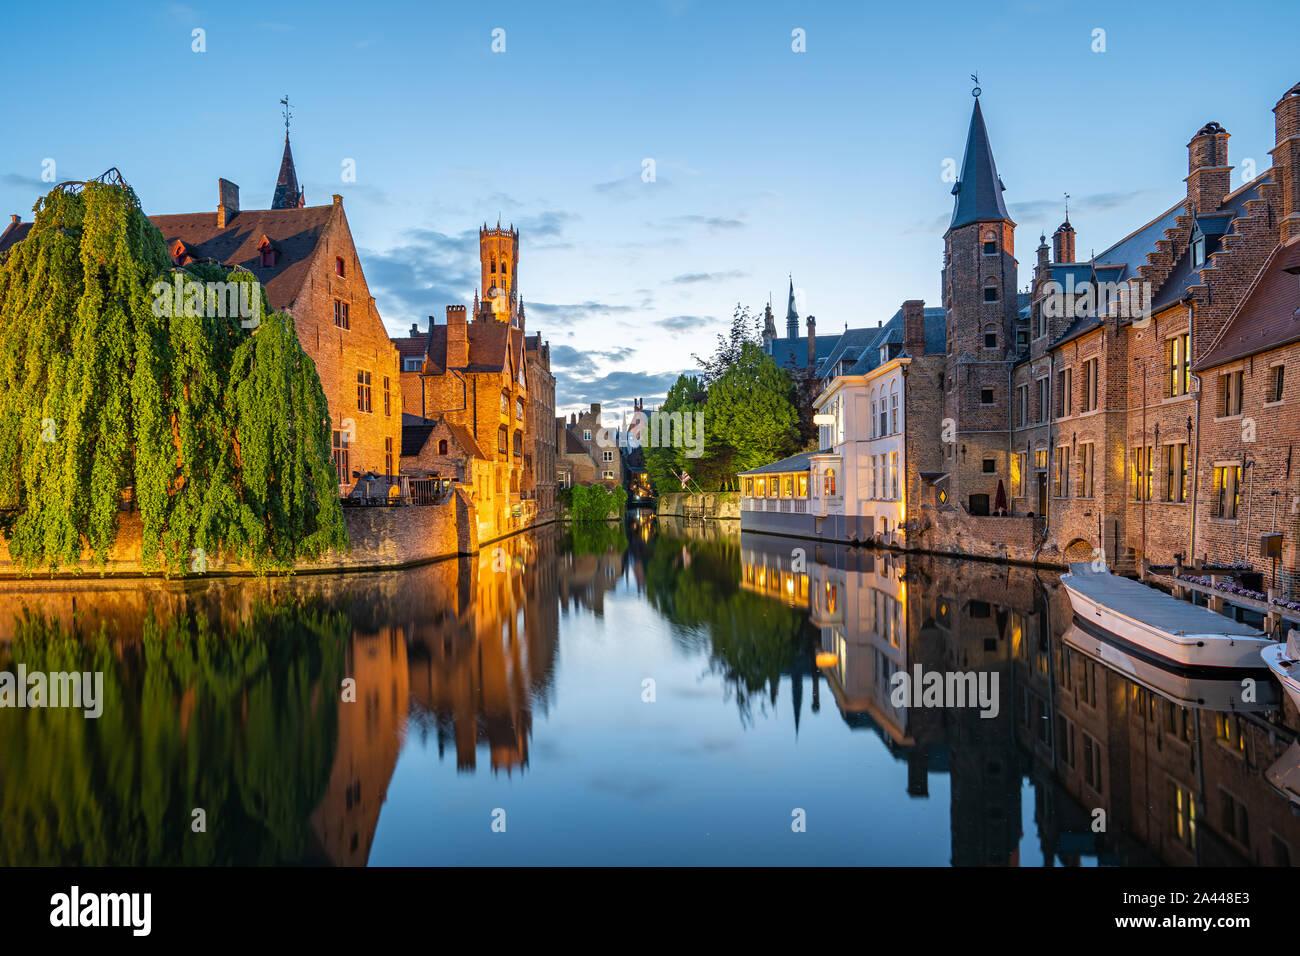 Bruges skyline con vecchi edifici al crepuscolo in Bruges, Belgio. Foto Stock